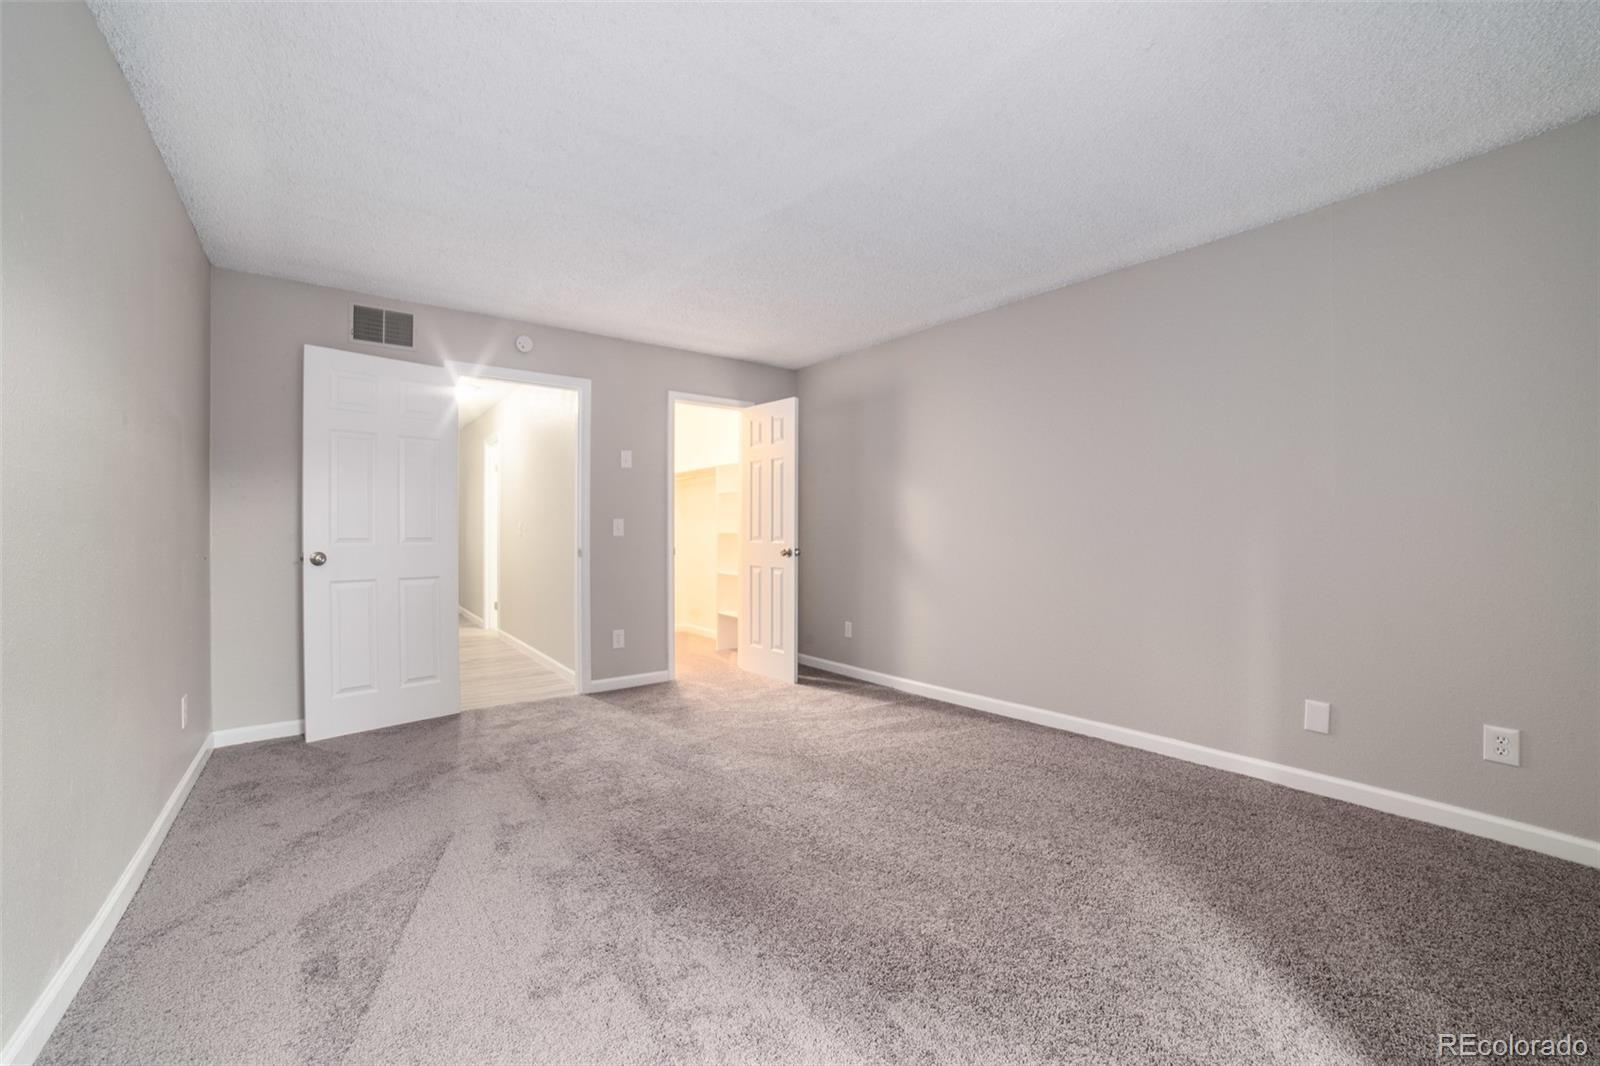 MLS# 8386467 - 12 - 220 Wright Street #203, Lakewood, CO 80228